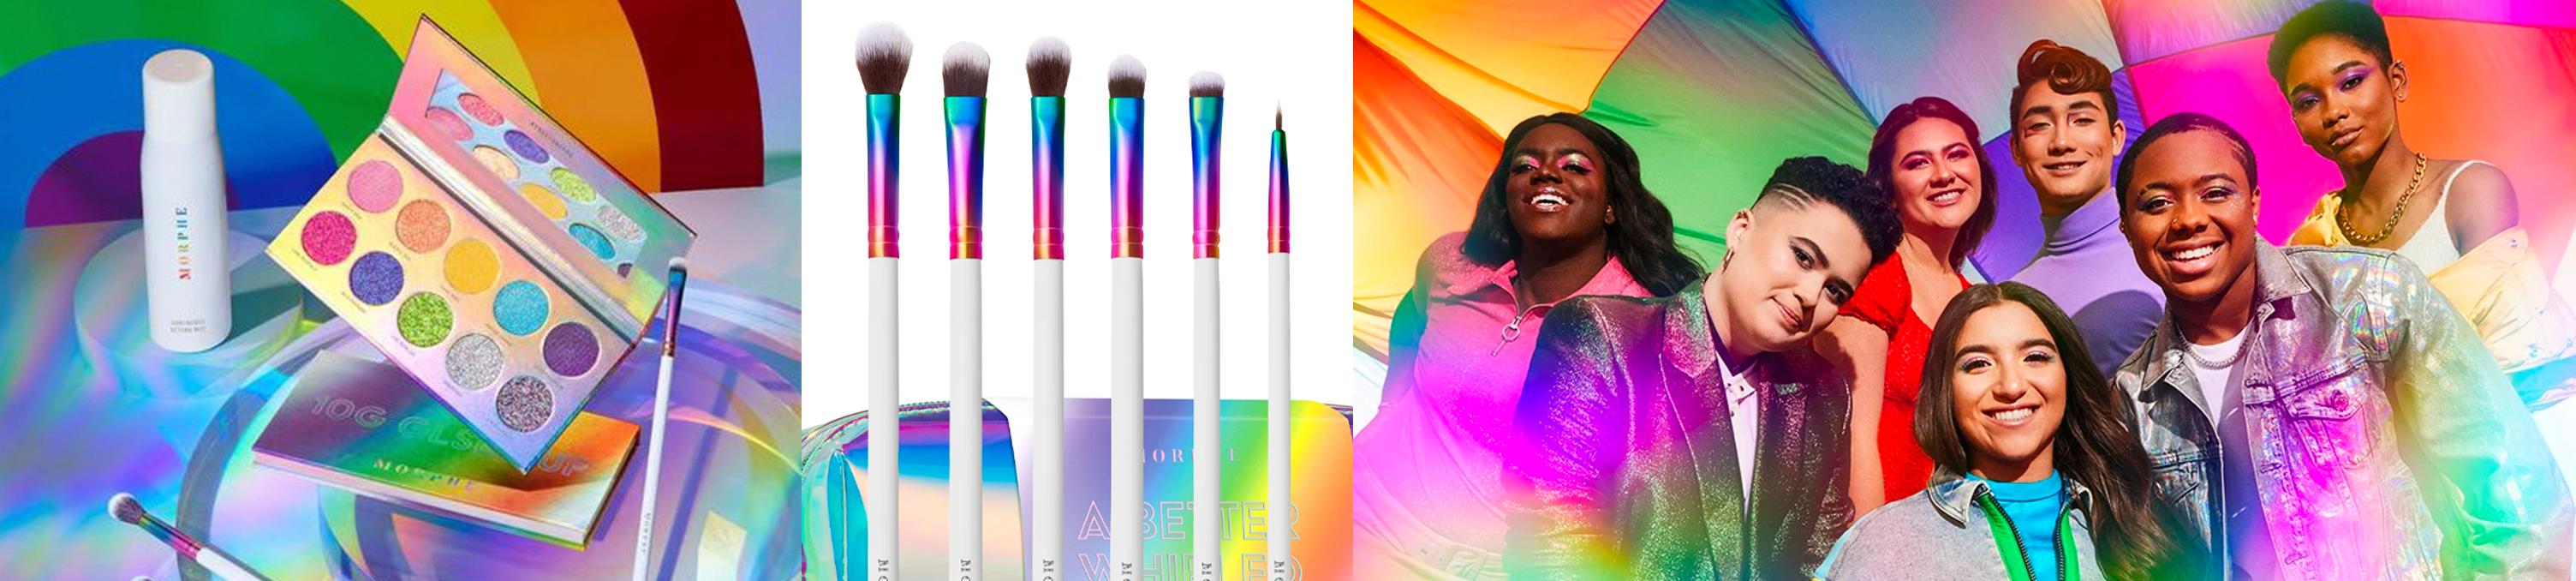 morphe rainbow collection pride 2020